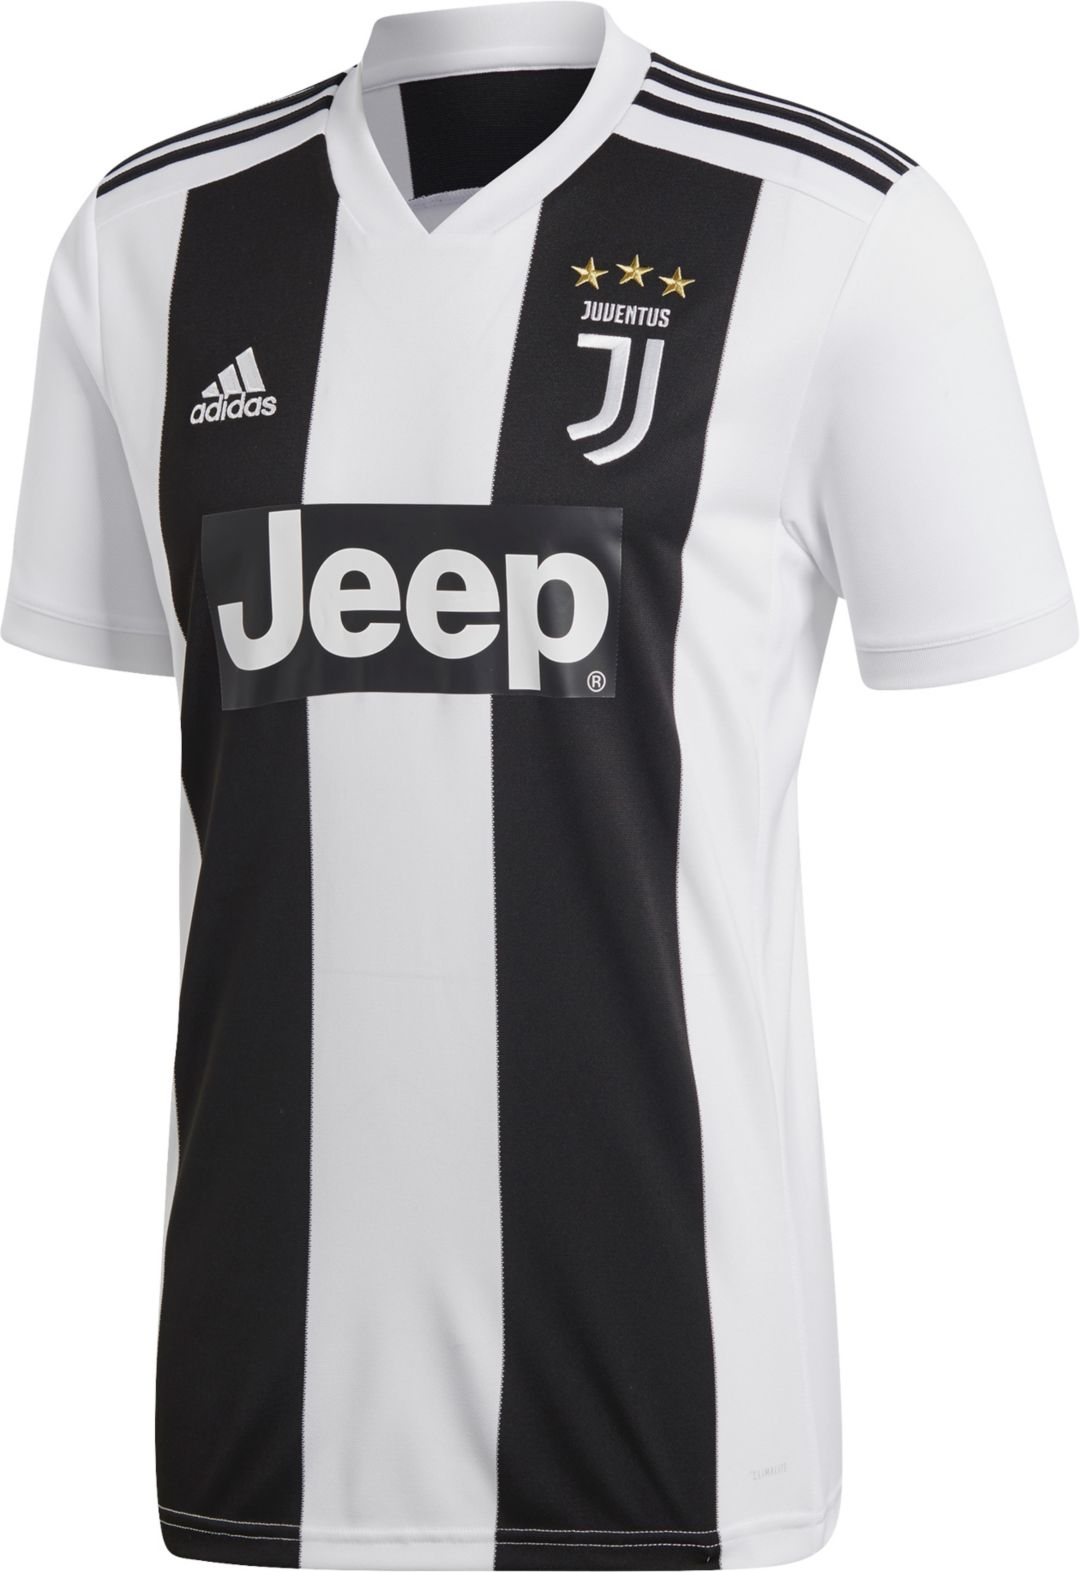 new concept 35f3b 41651 adidas Youth Juventus Stadium Cristiano Ronaldo #7 Home Replica Jersey